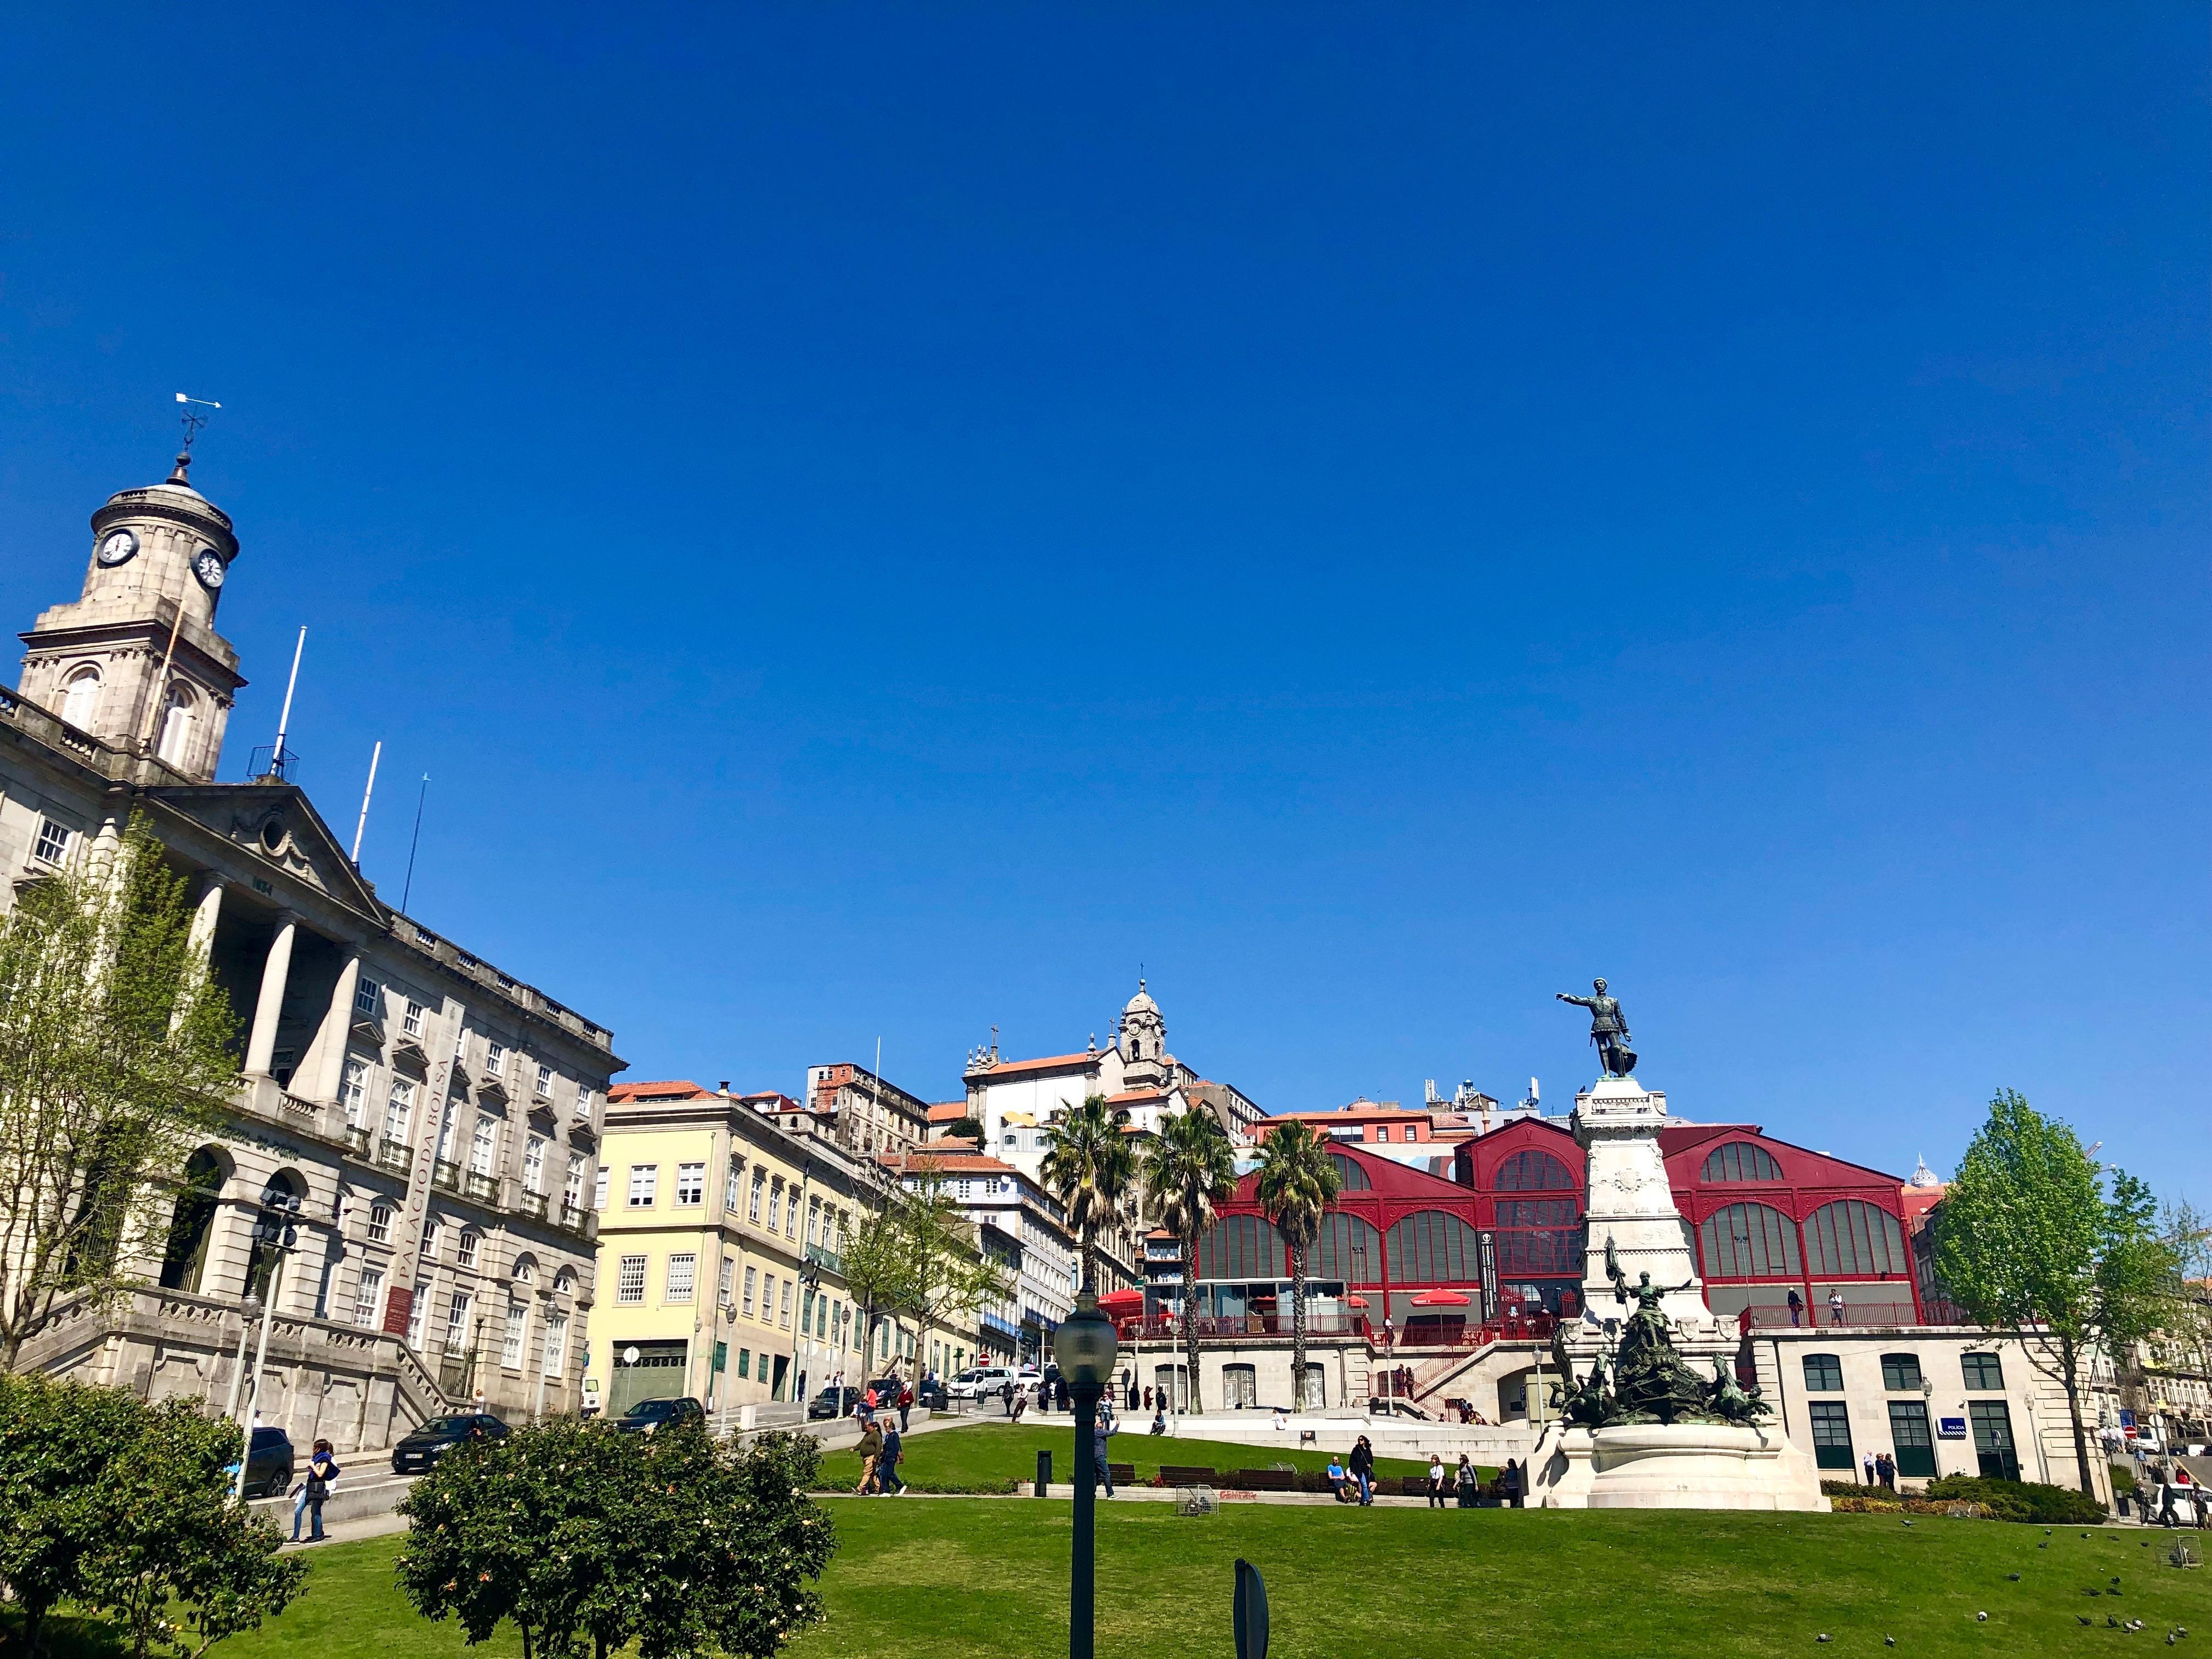 PORTUGALIA - LATO 2019: Moov Hotel Porto Norte**, 5 dni (22-26.10.2019 r.), śniadania: 3 os. dorosłe